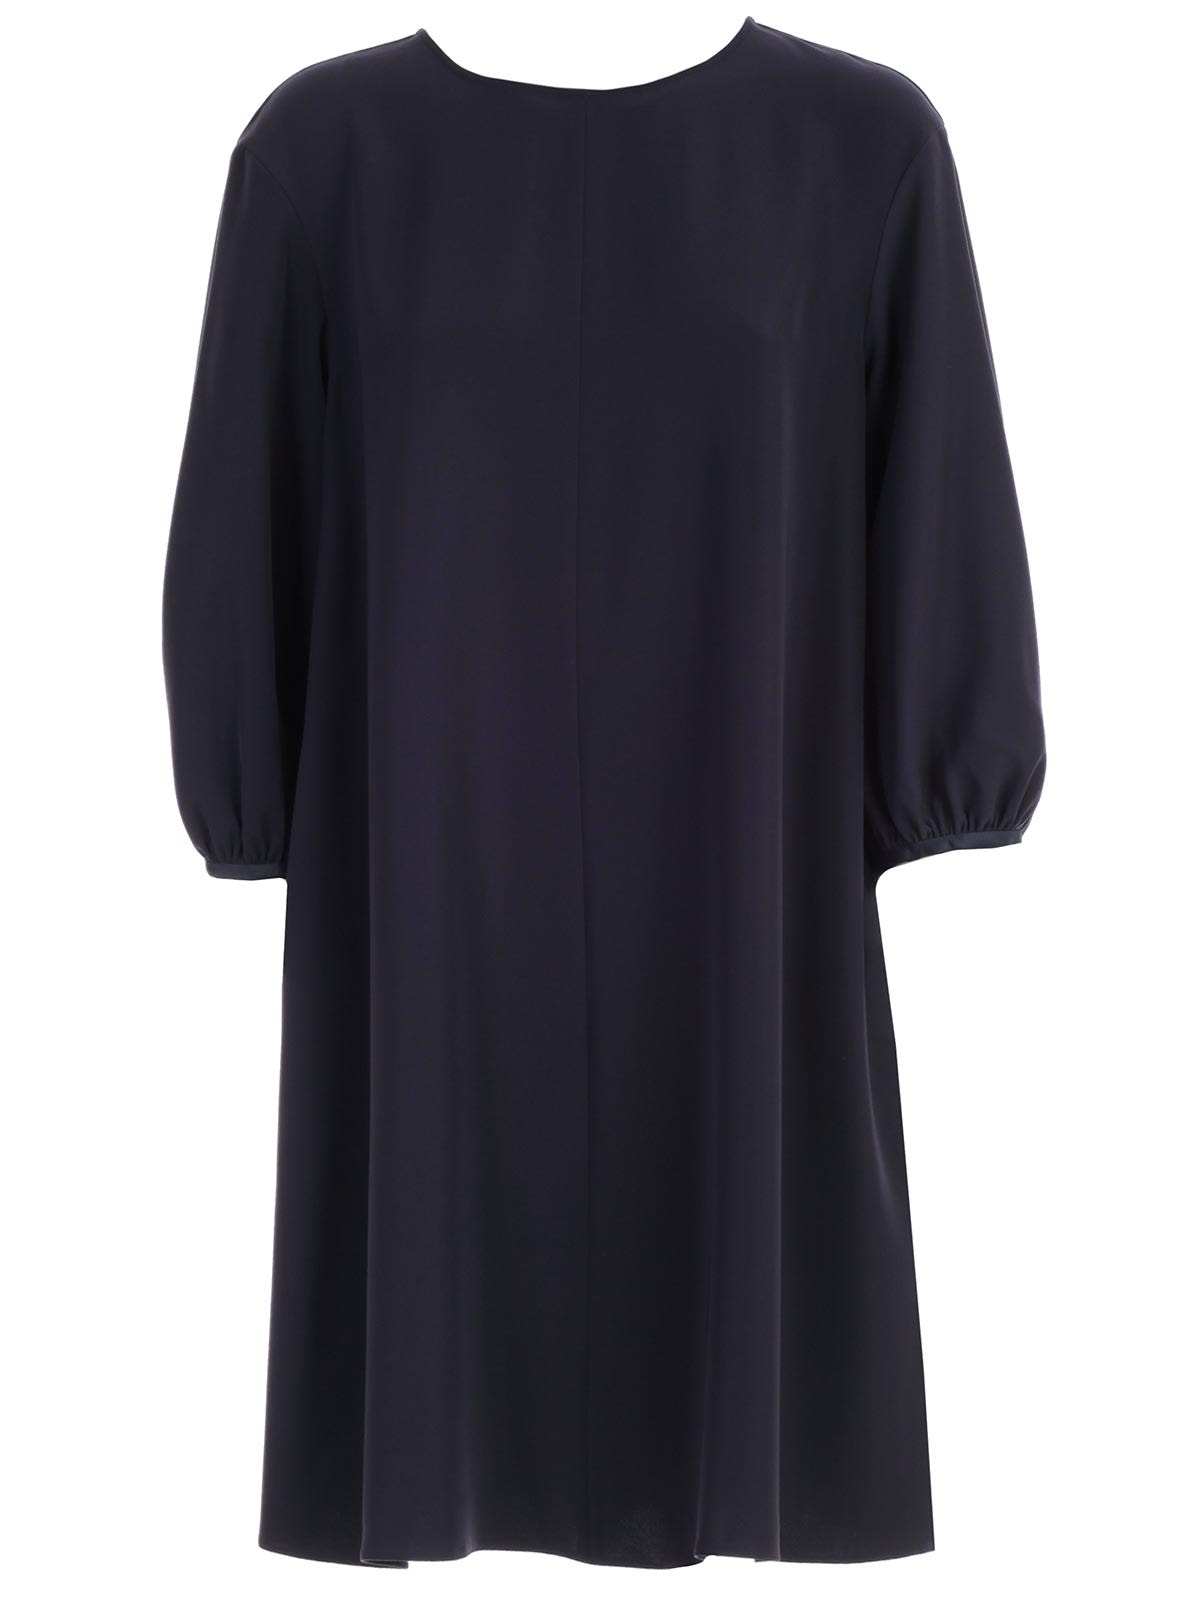 Emporio Armani Dress Short 3 & 4s